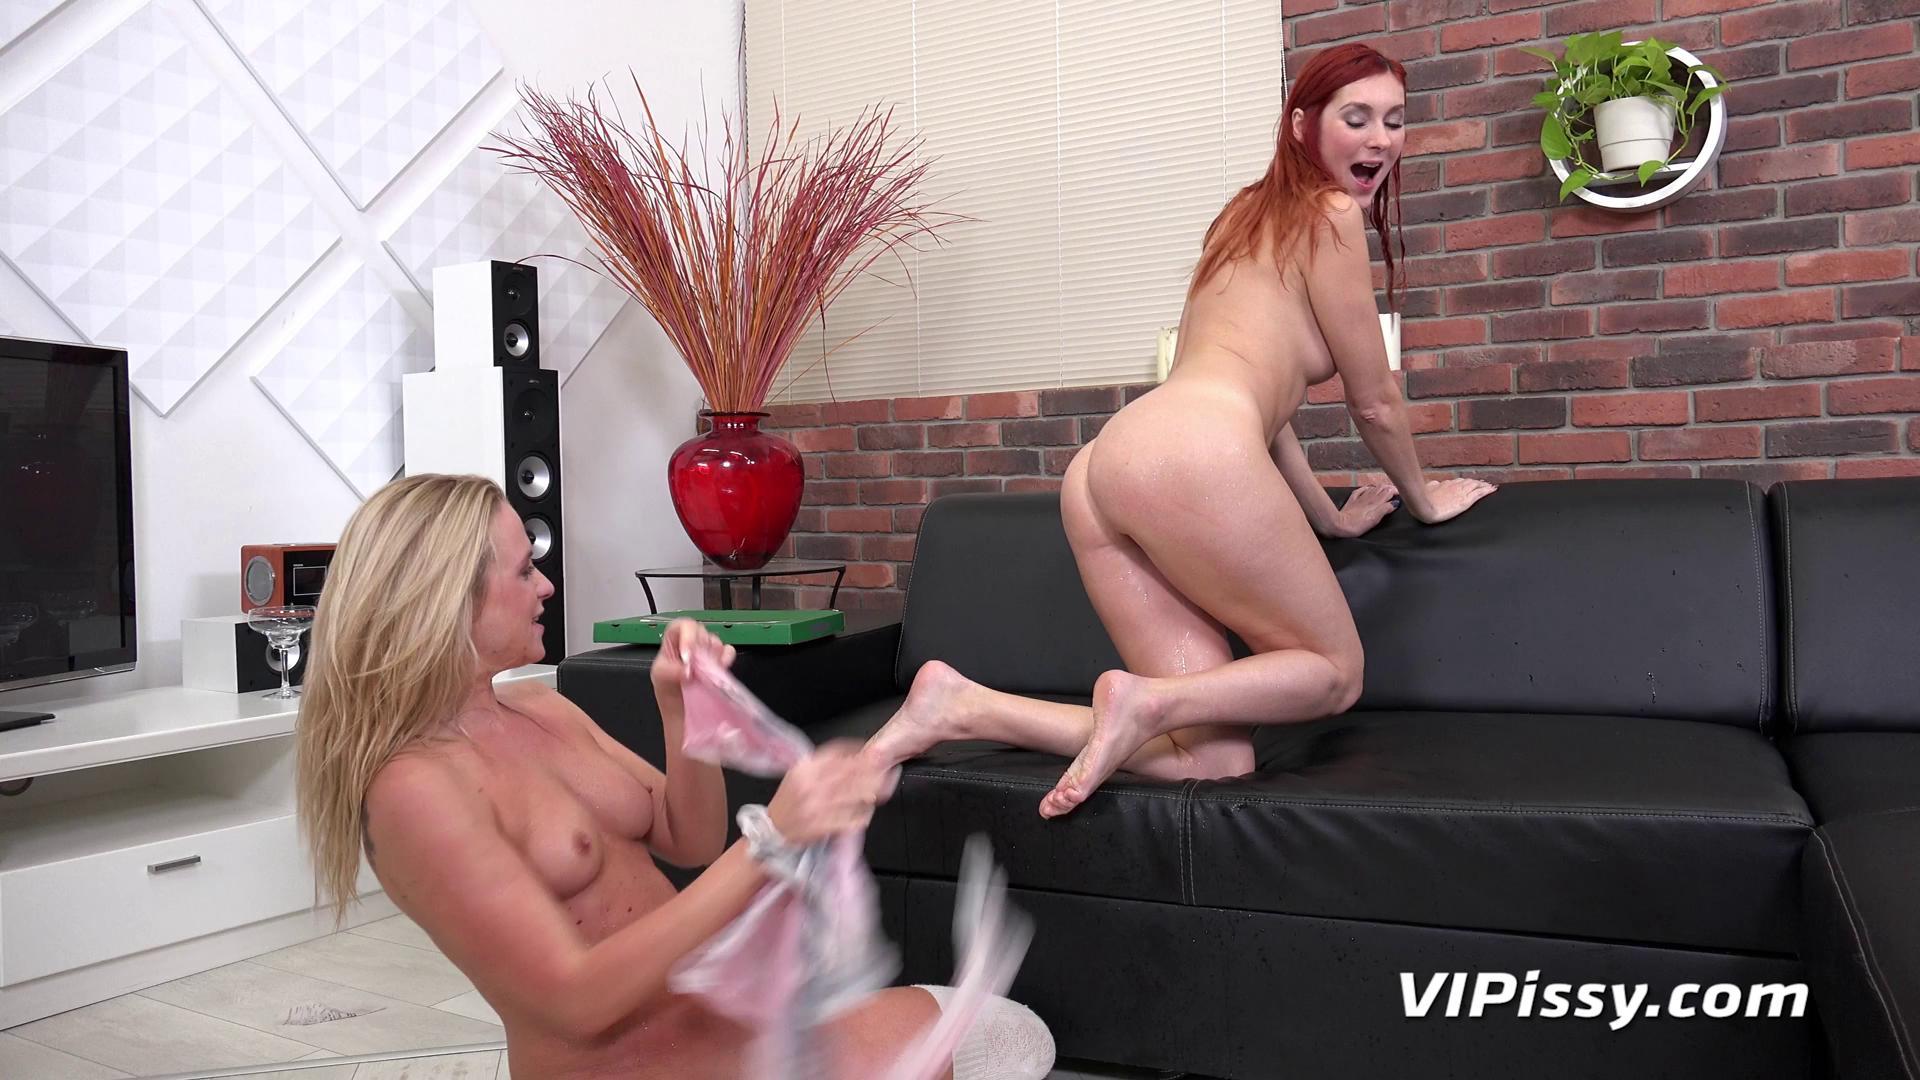 VIPissy – Kattie Gold And Vinna Reed